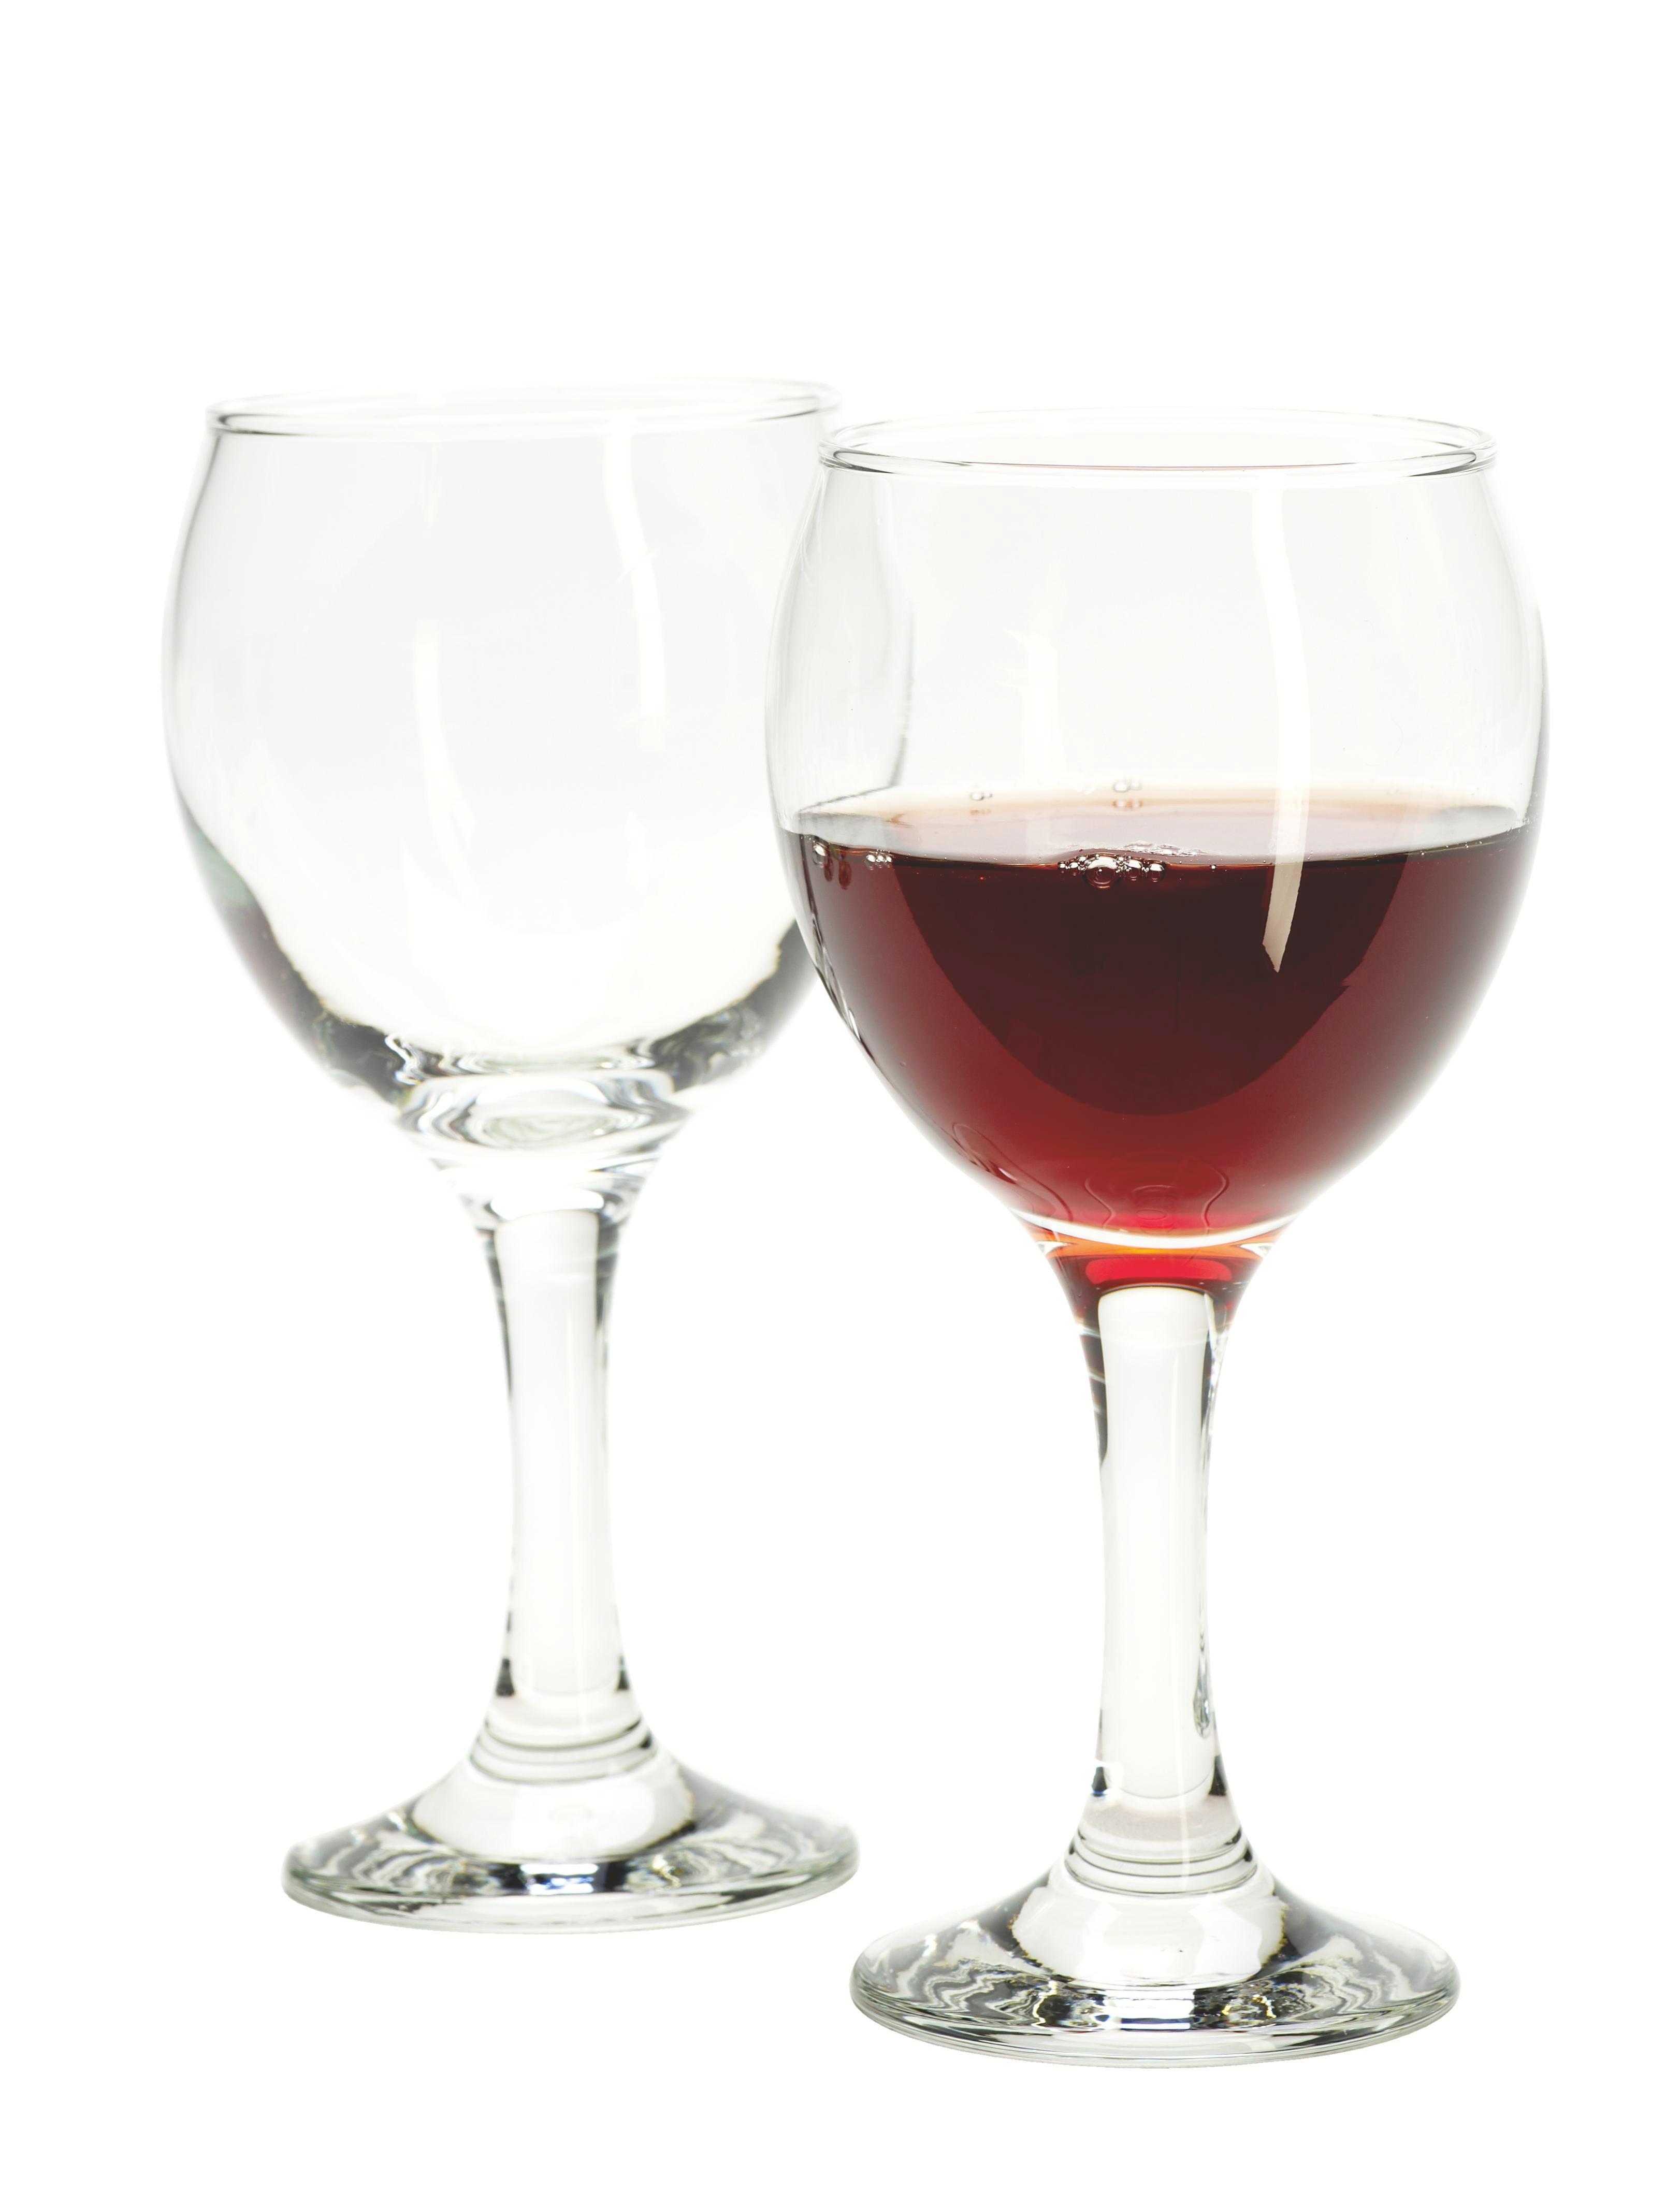 Rotweinglas Billie ca. 340ml - Klar, Glas (7,5/17,7cm) - MÖMAX modern living